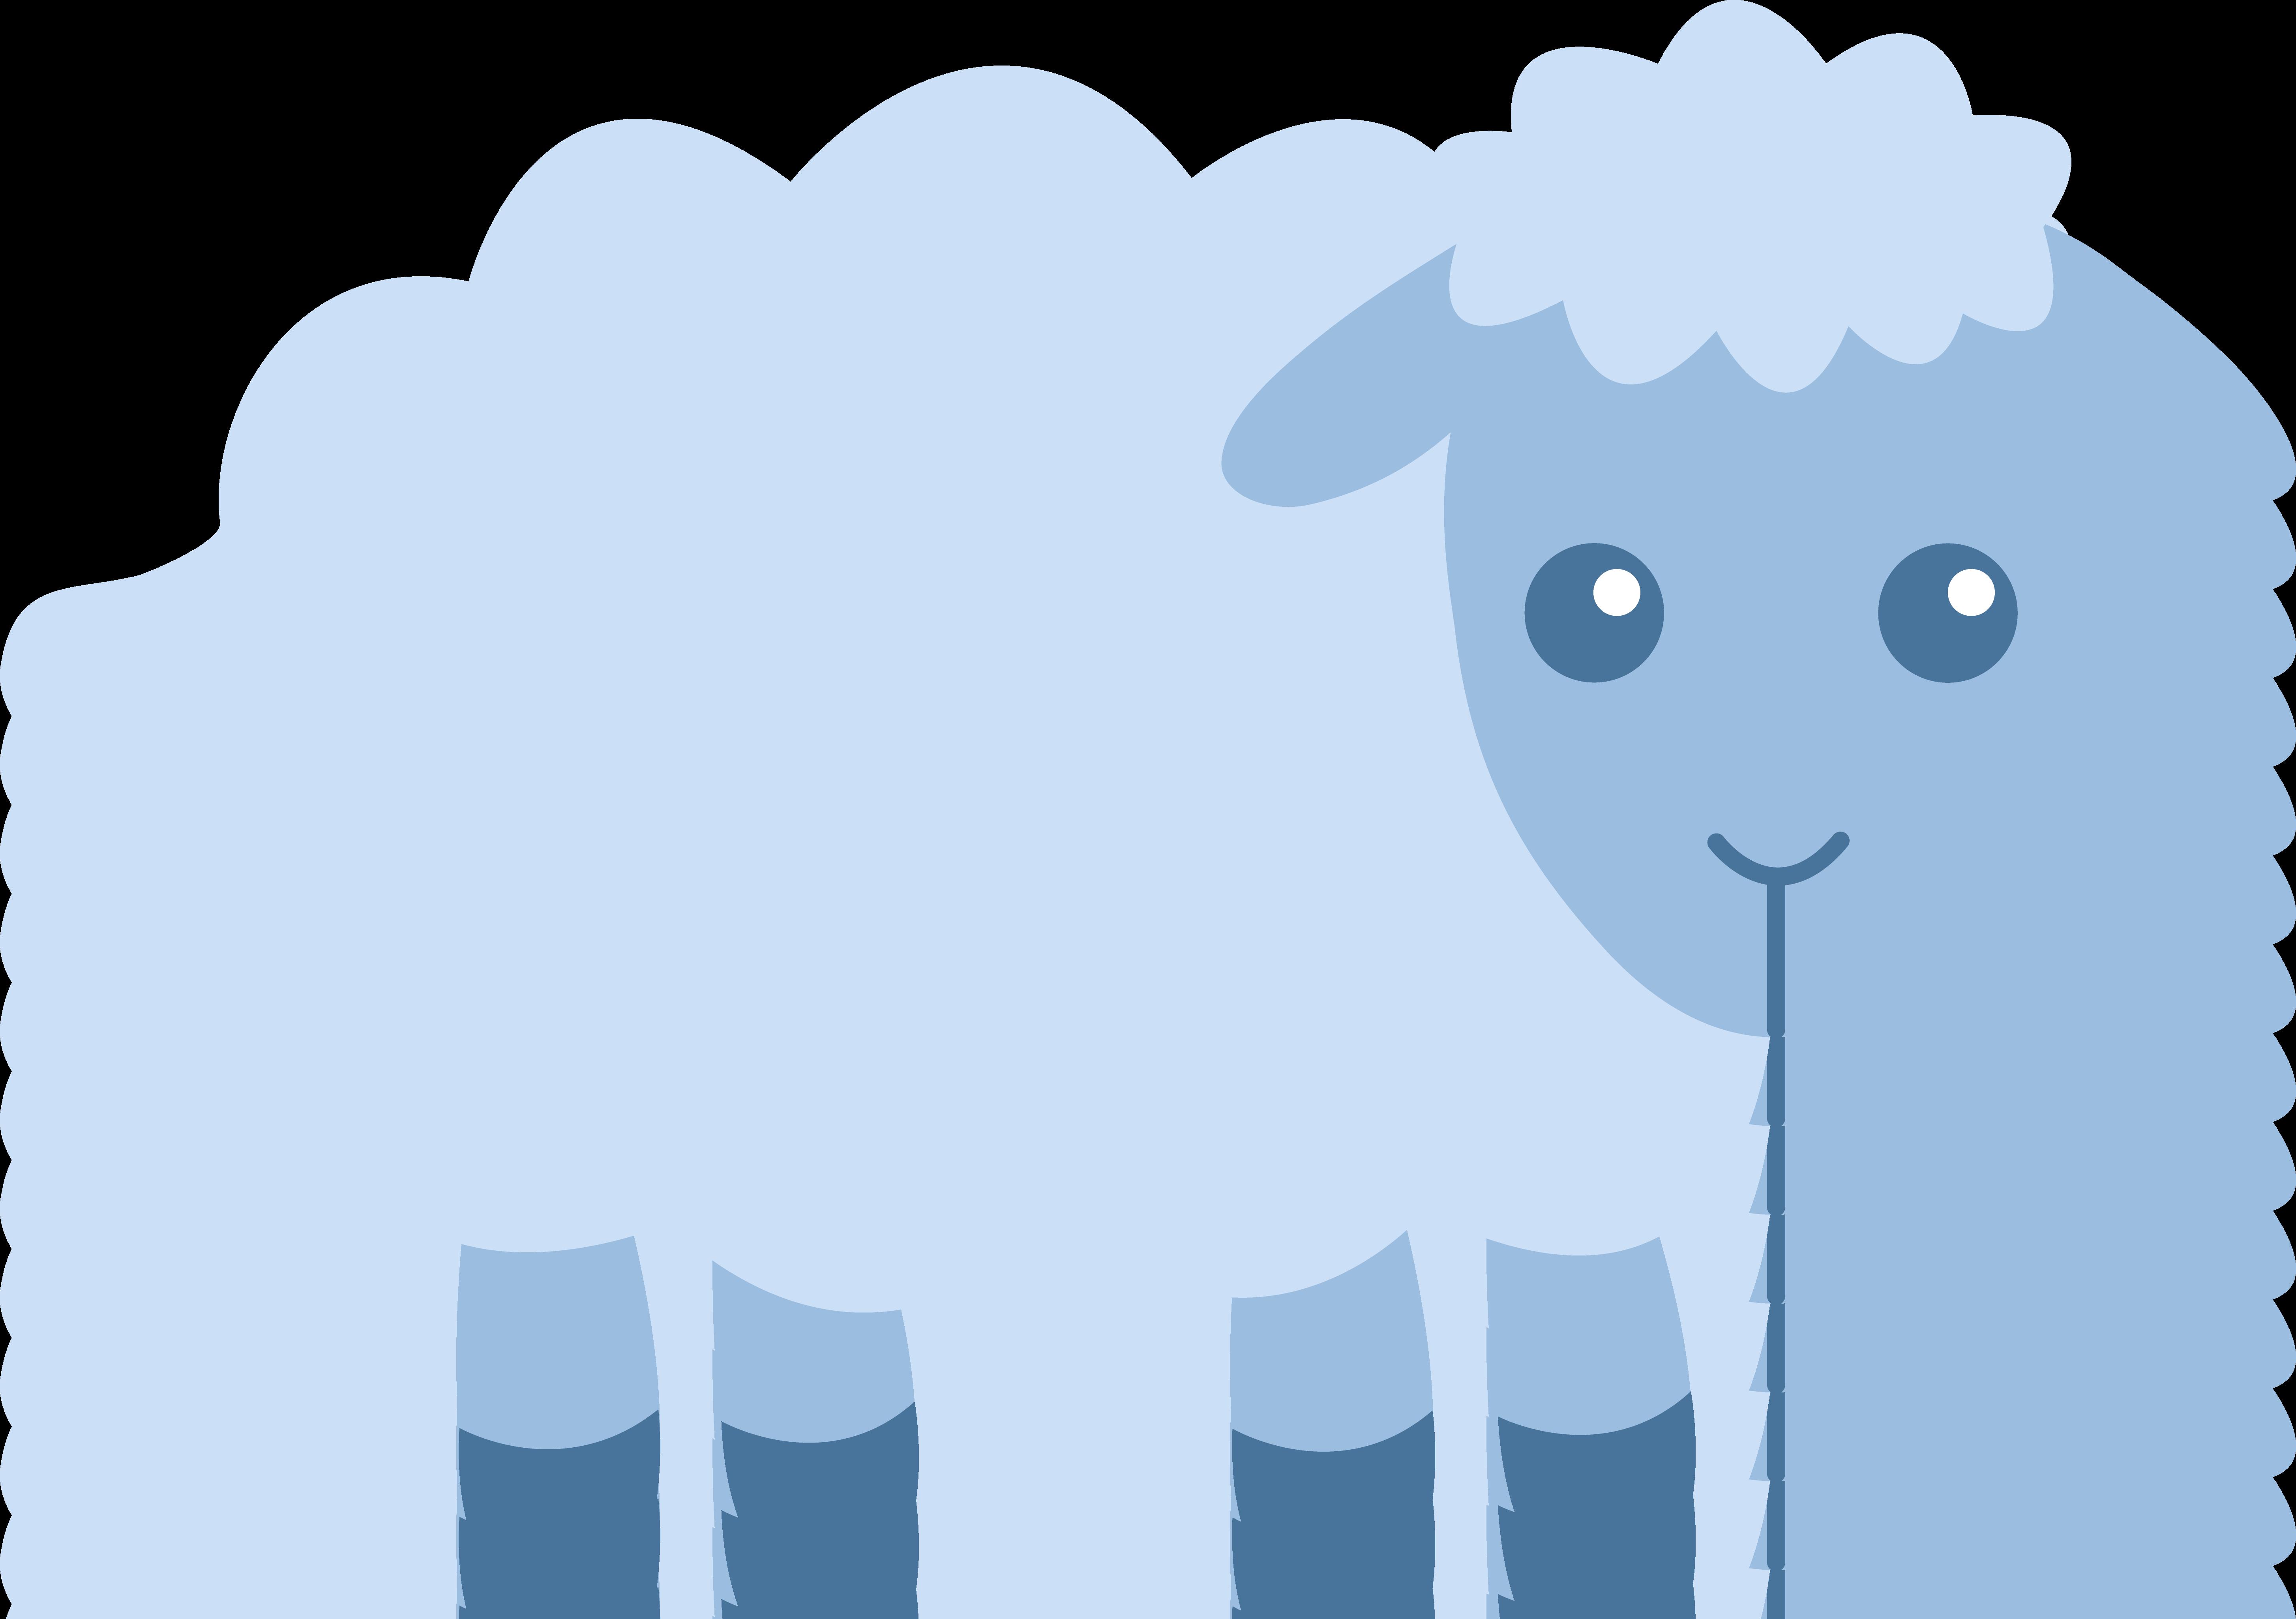 5817x4102 Drawn Sheep Baby Sheep